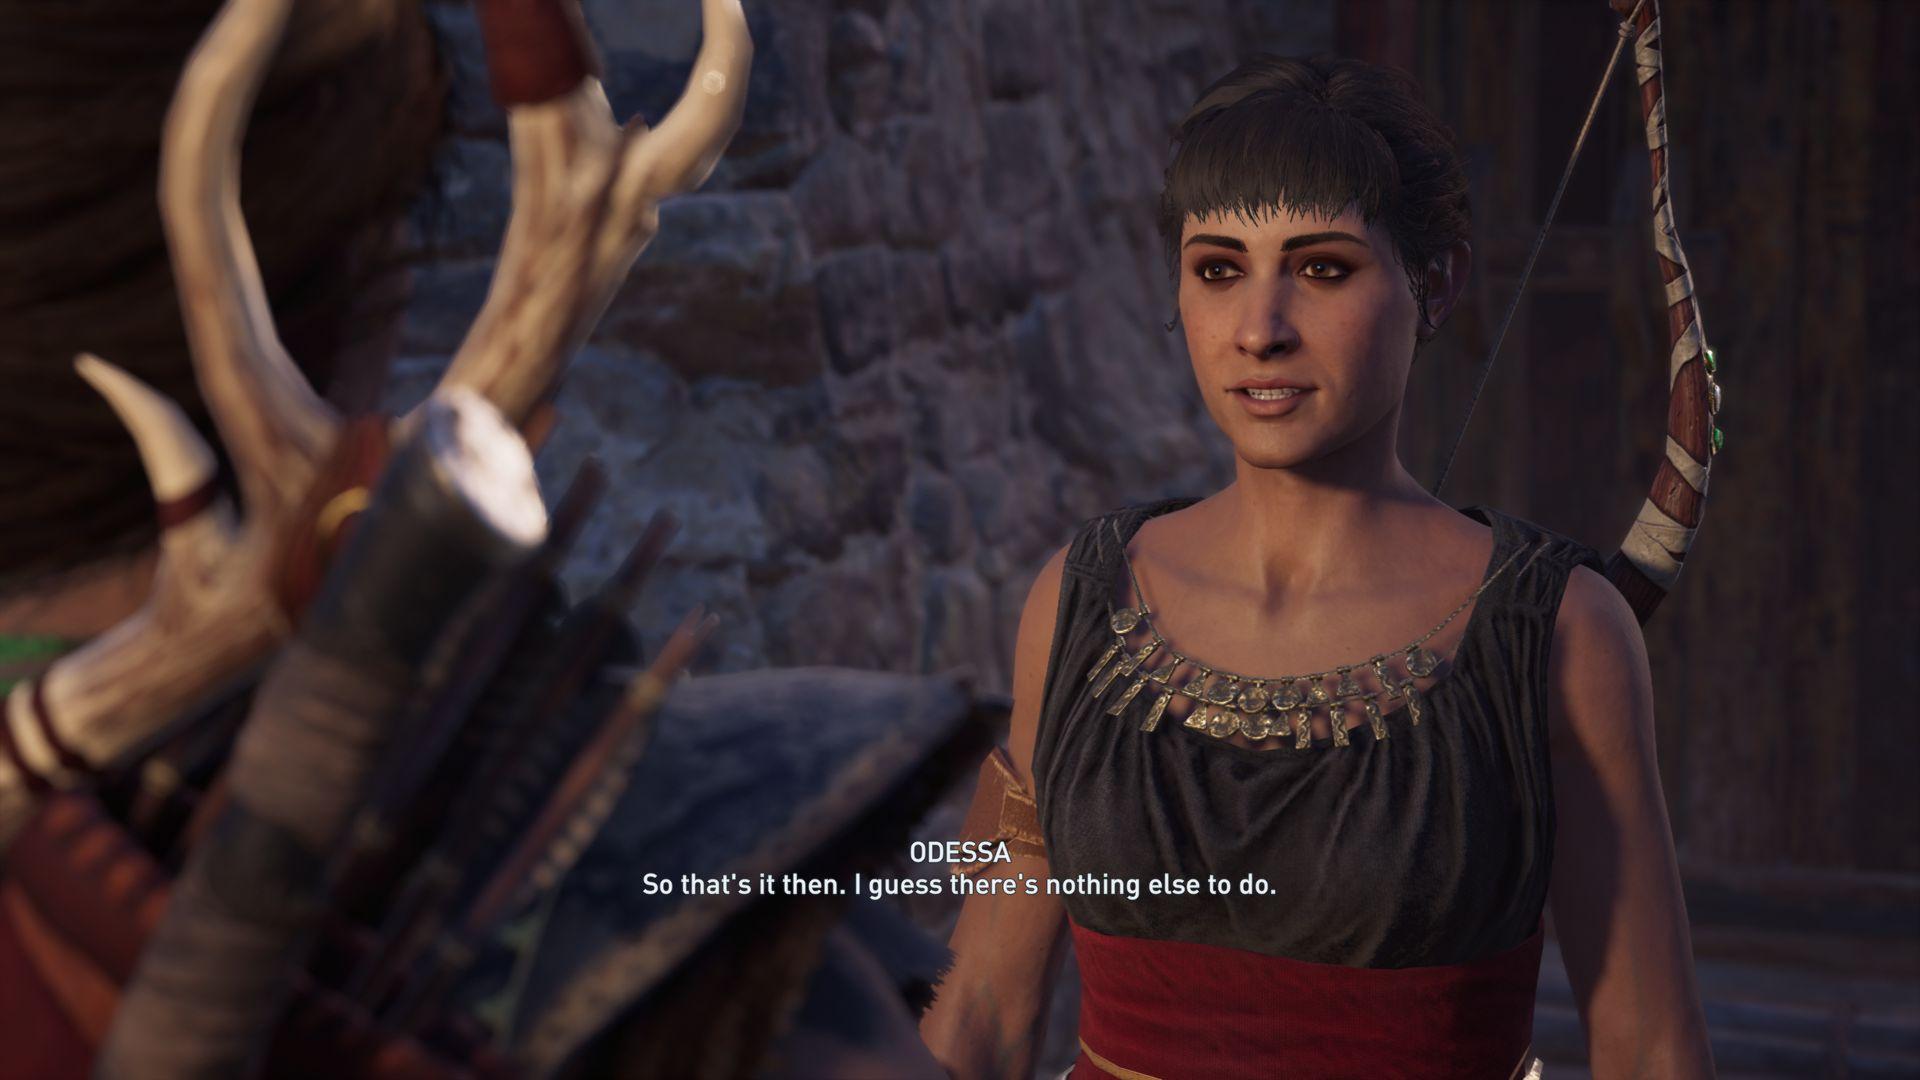 Girls hot s assassin creed